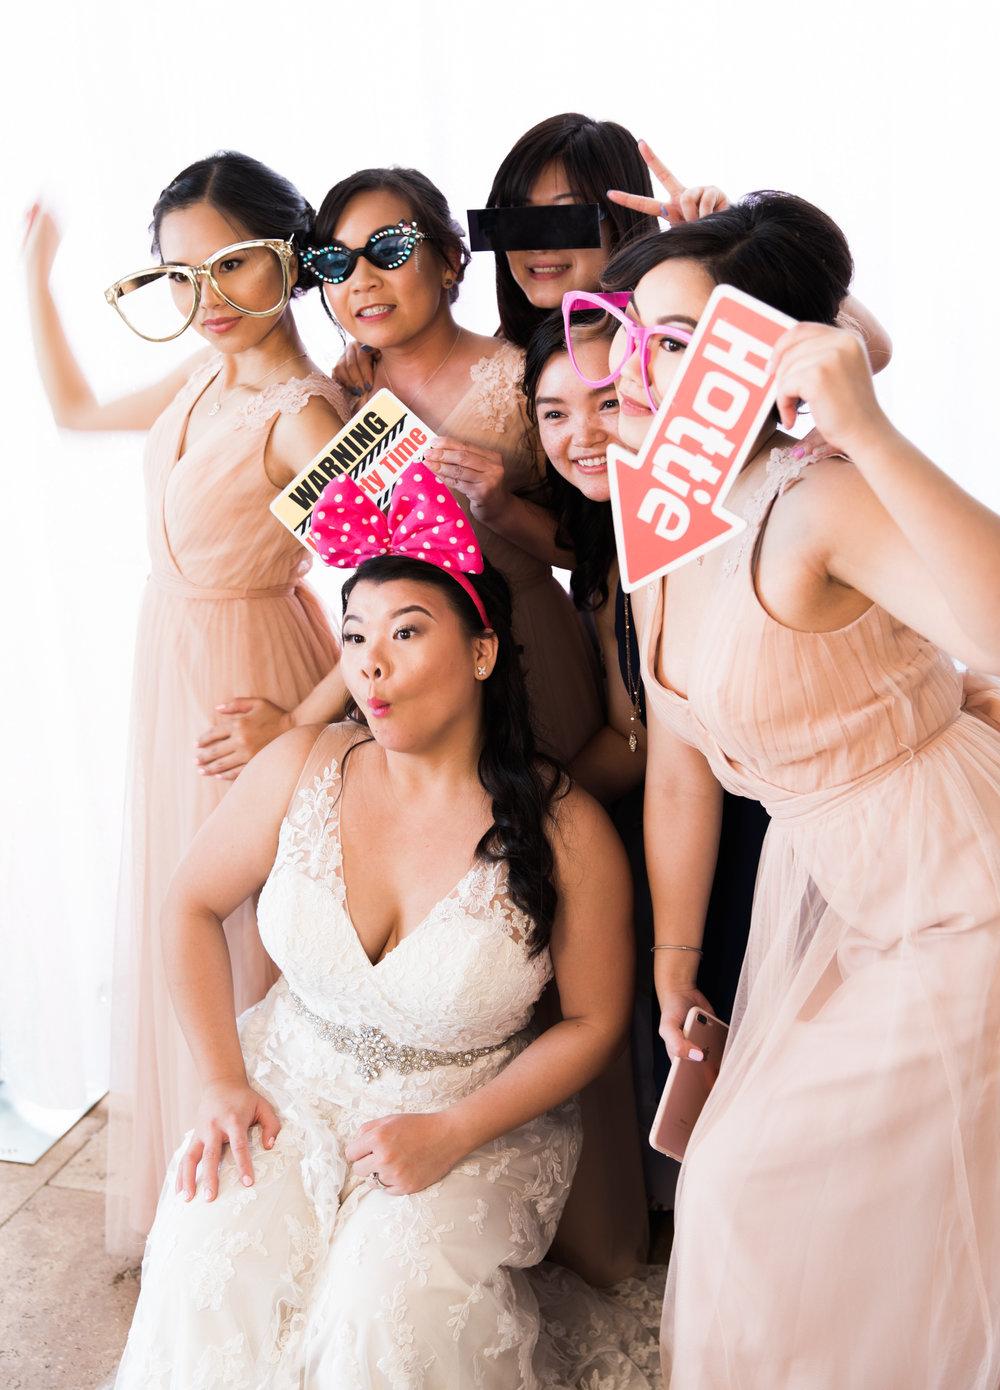 Bonphotage Galleria Marchetti Wedding Photography